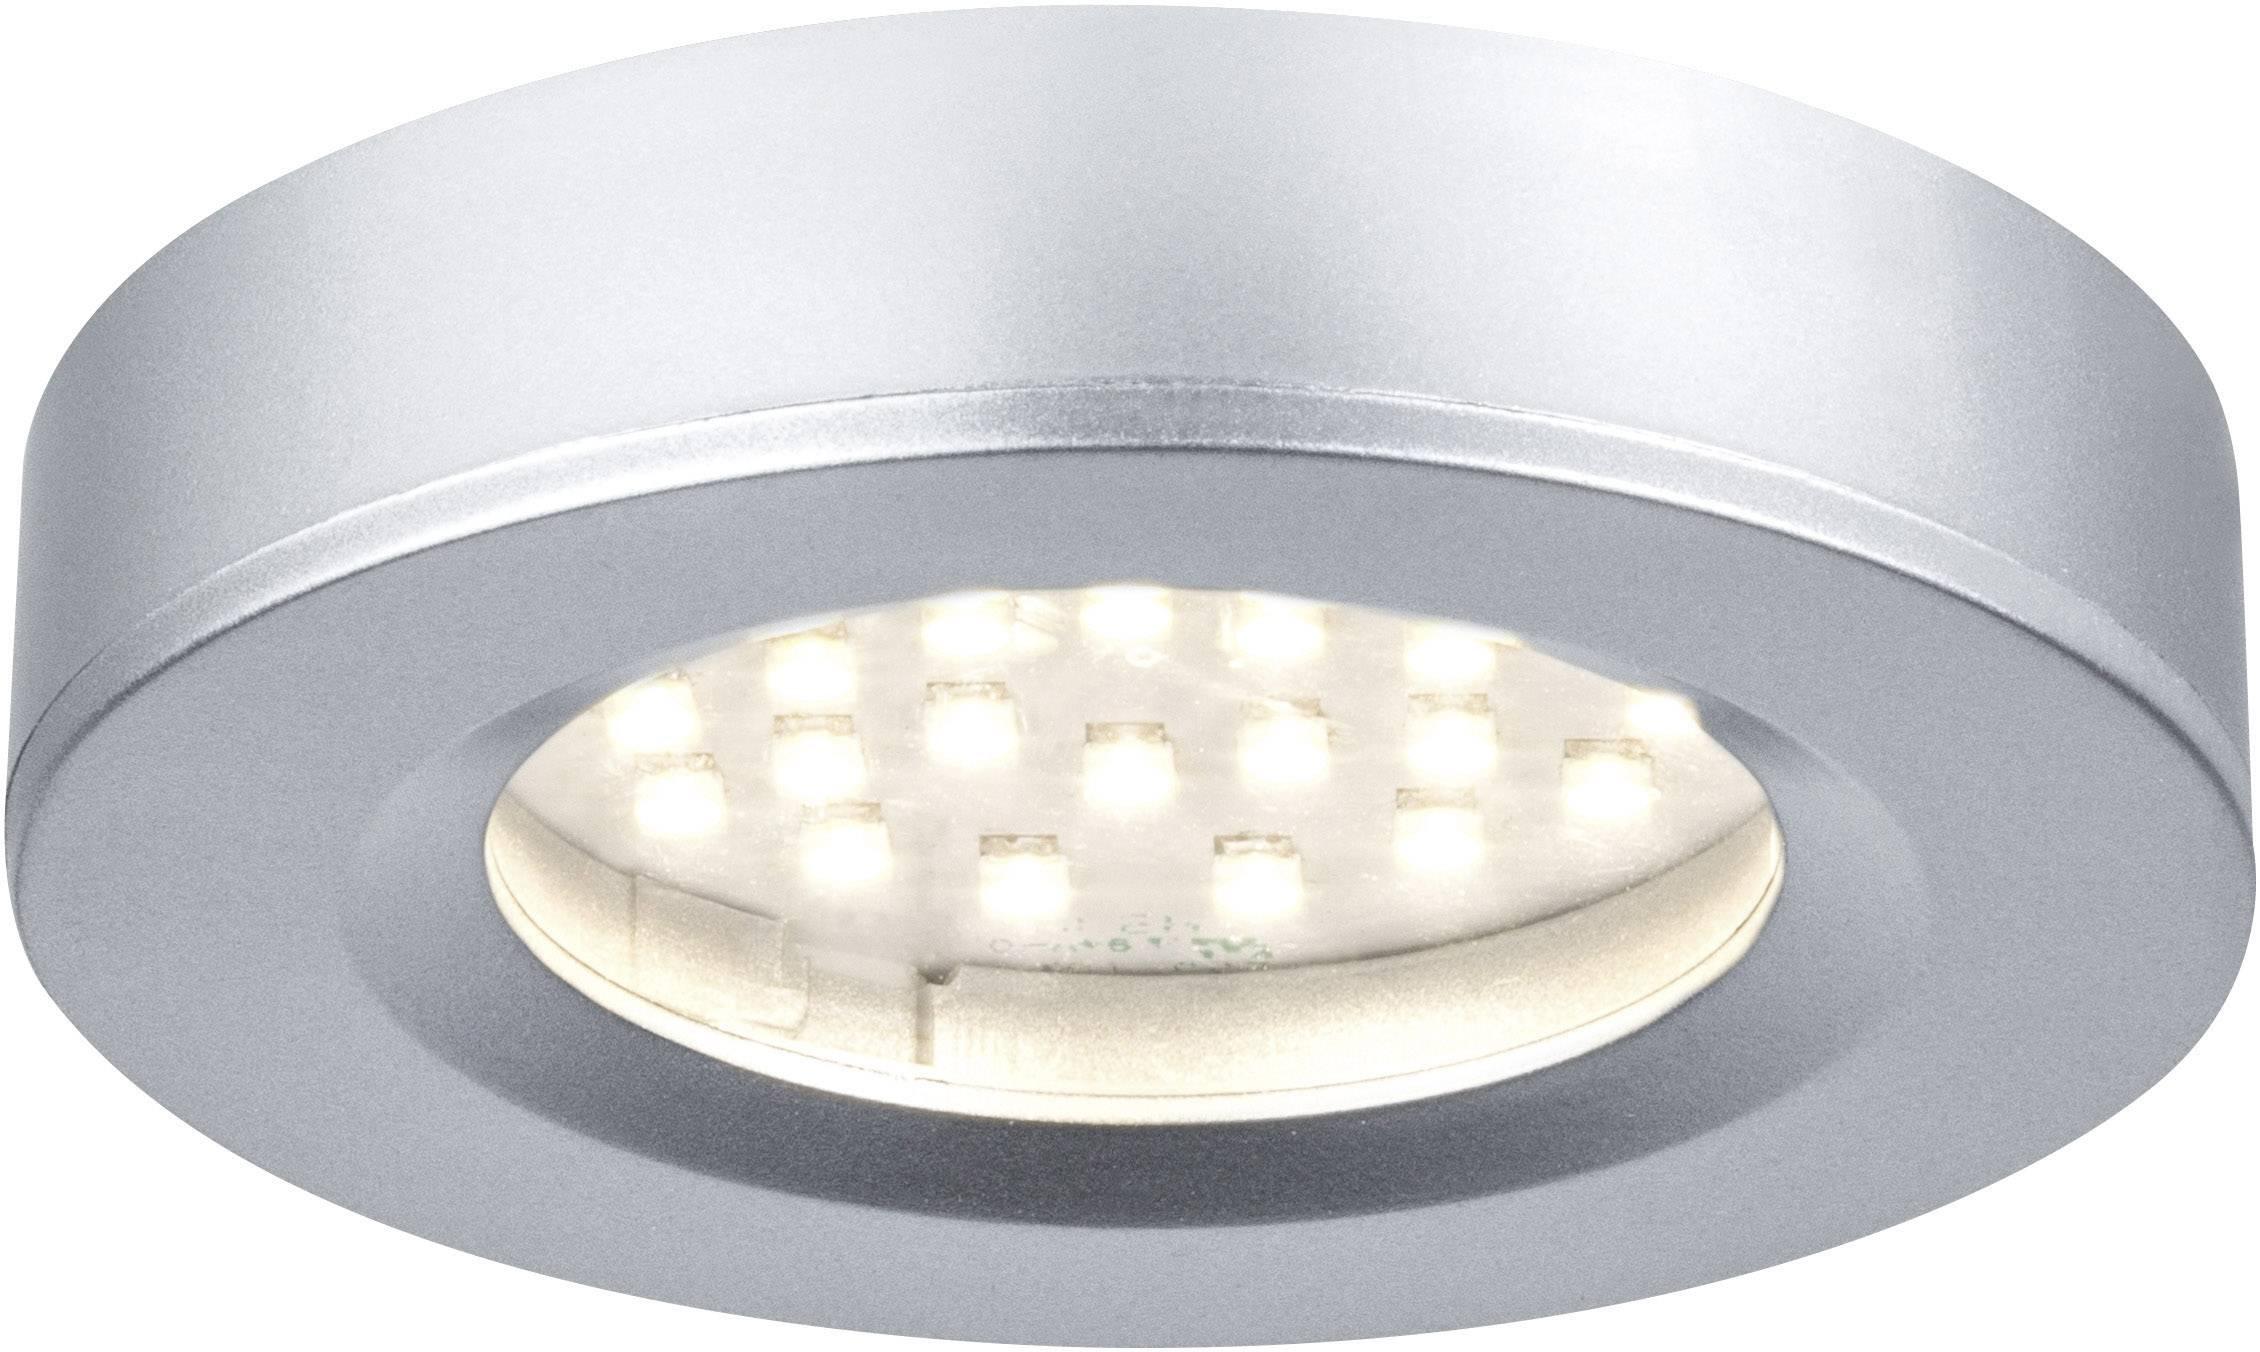 Populära LED-utomhusbelysning tak Paulmann Platy 93580 7.5 W Varmvit Krom YM-98